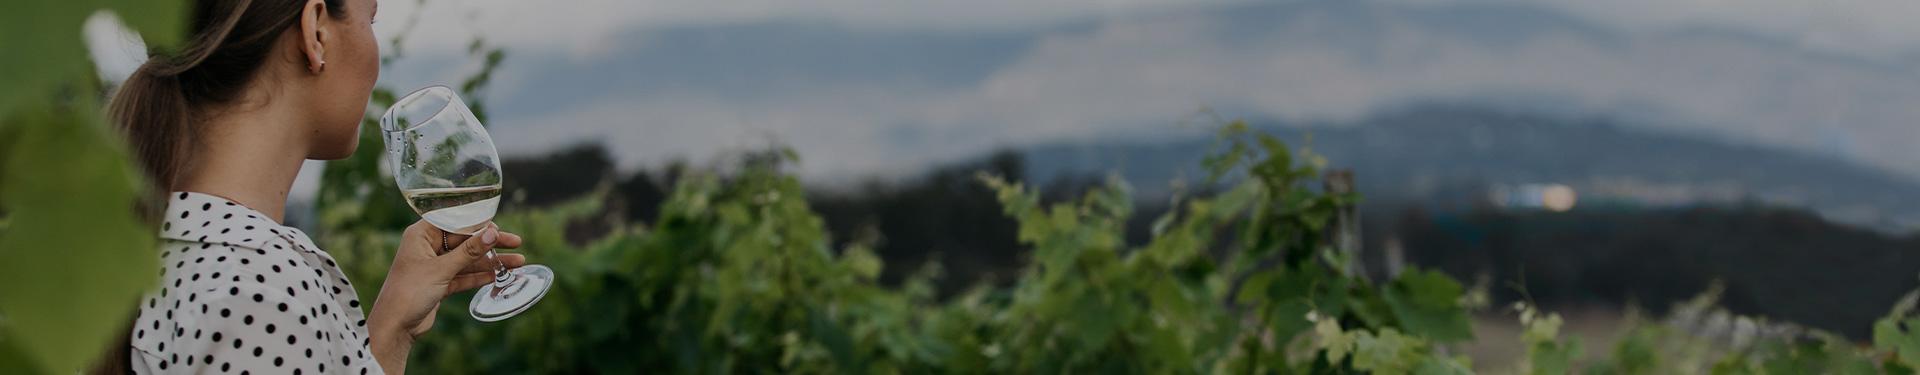 australian wine reagion banner - girl drinking wine in the vineyard